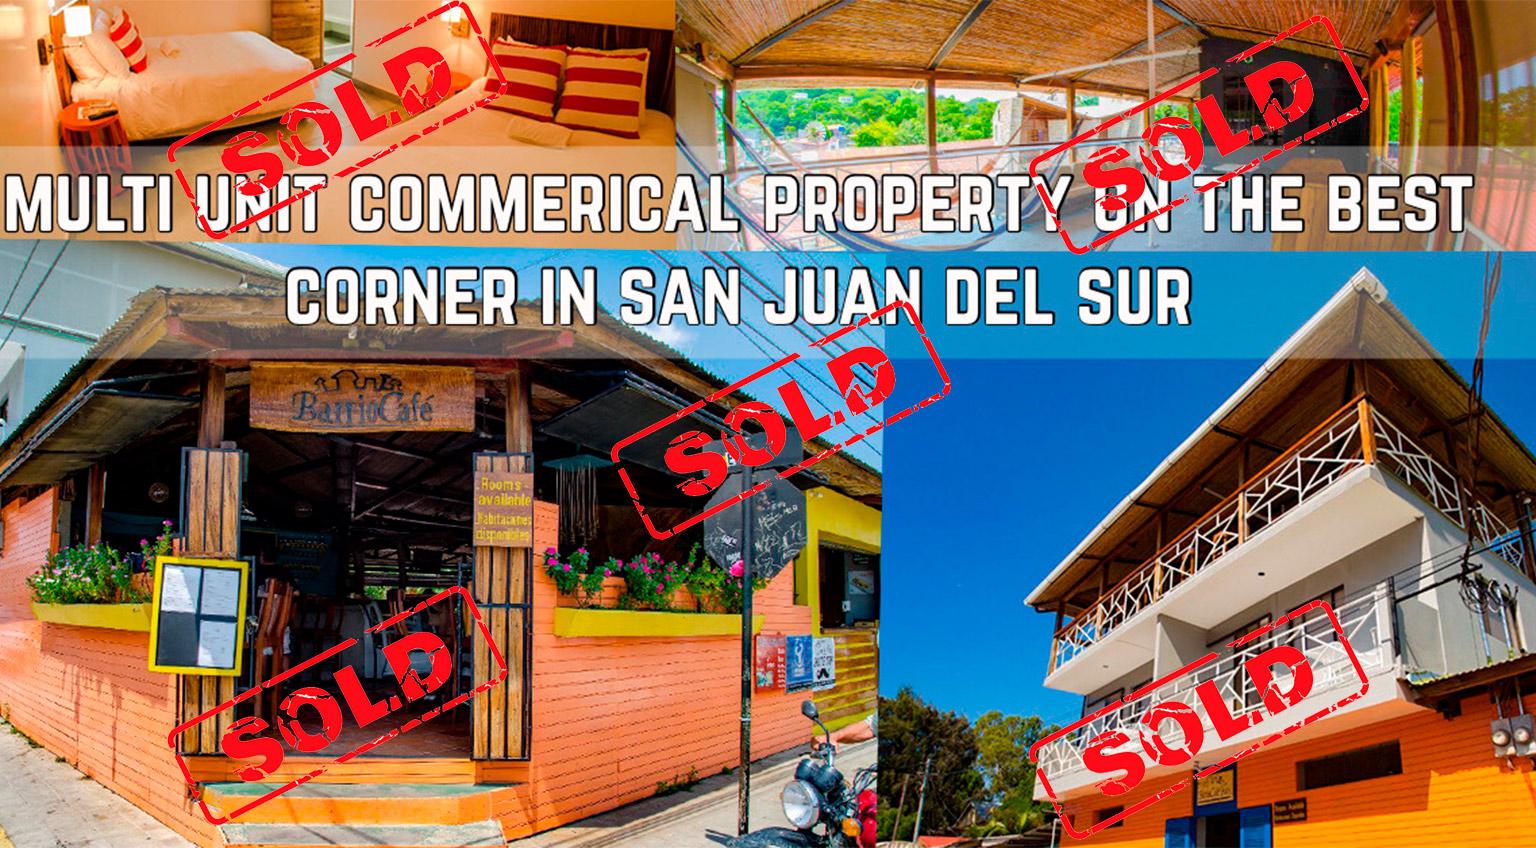 Multi Business Commercial Property on the Best Corner In San Juan Del Sur